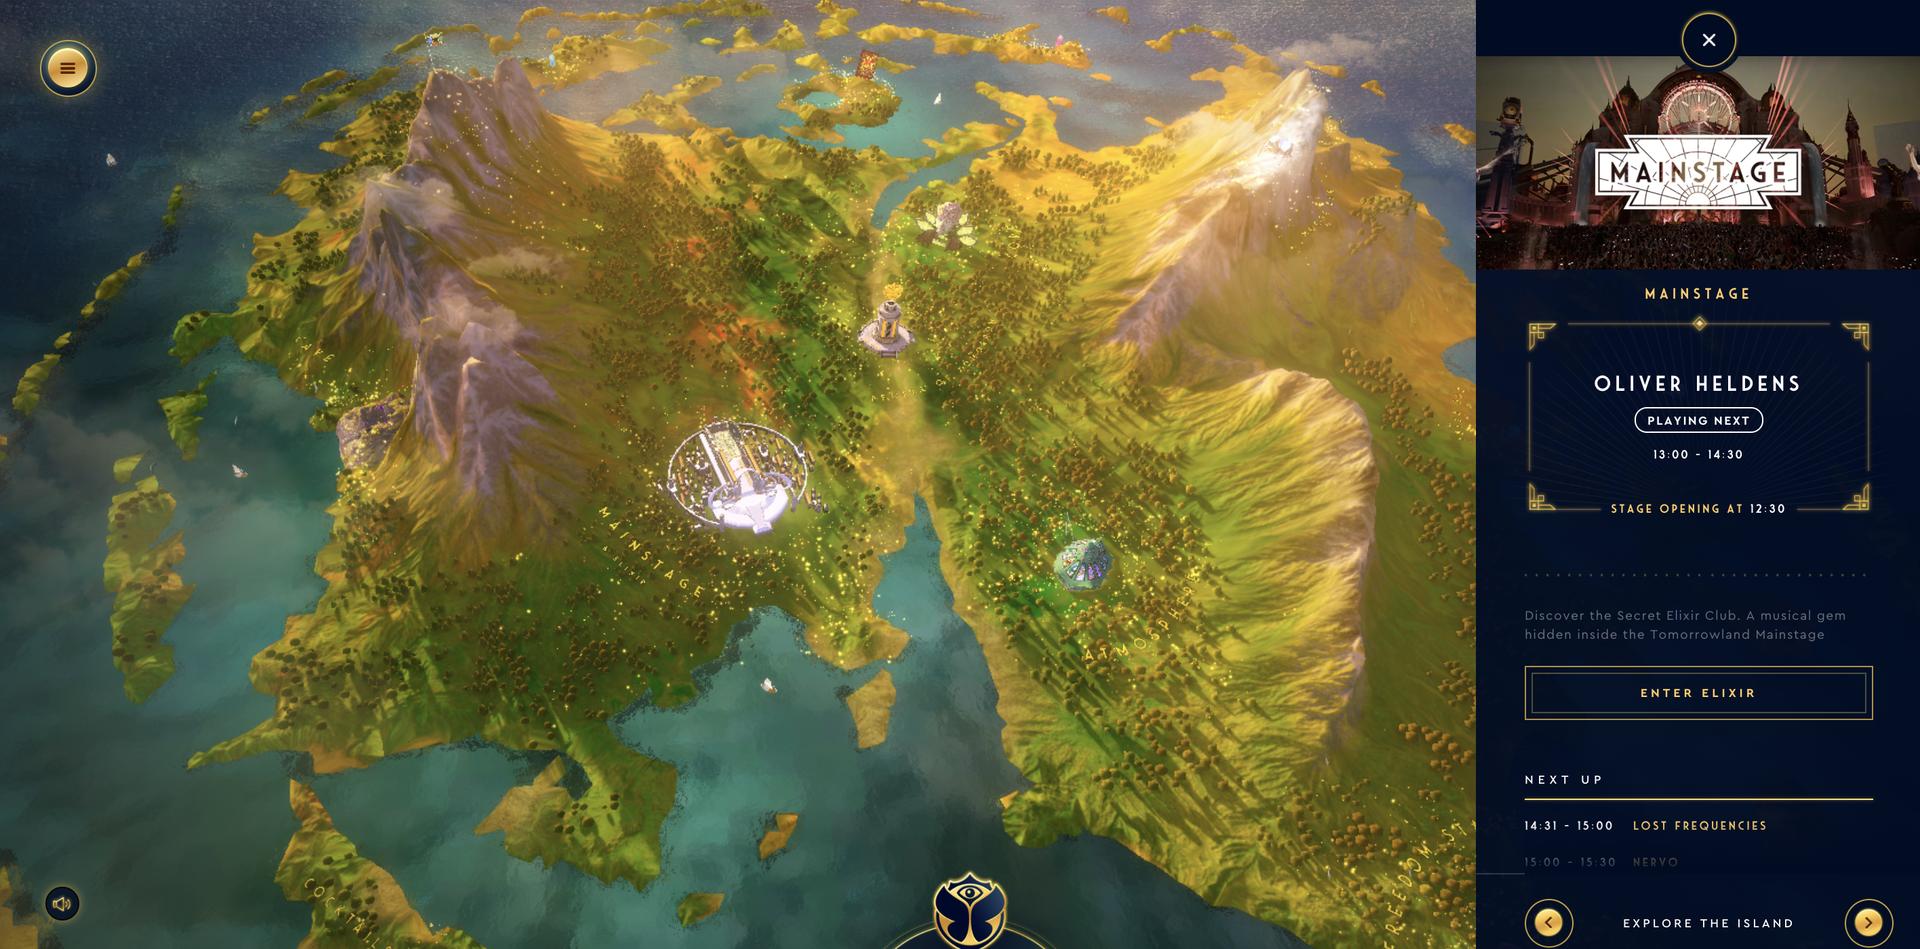 O mundo mágico do Tomorrowland Around The World - na foto, o Mainstage